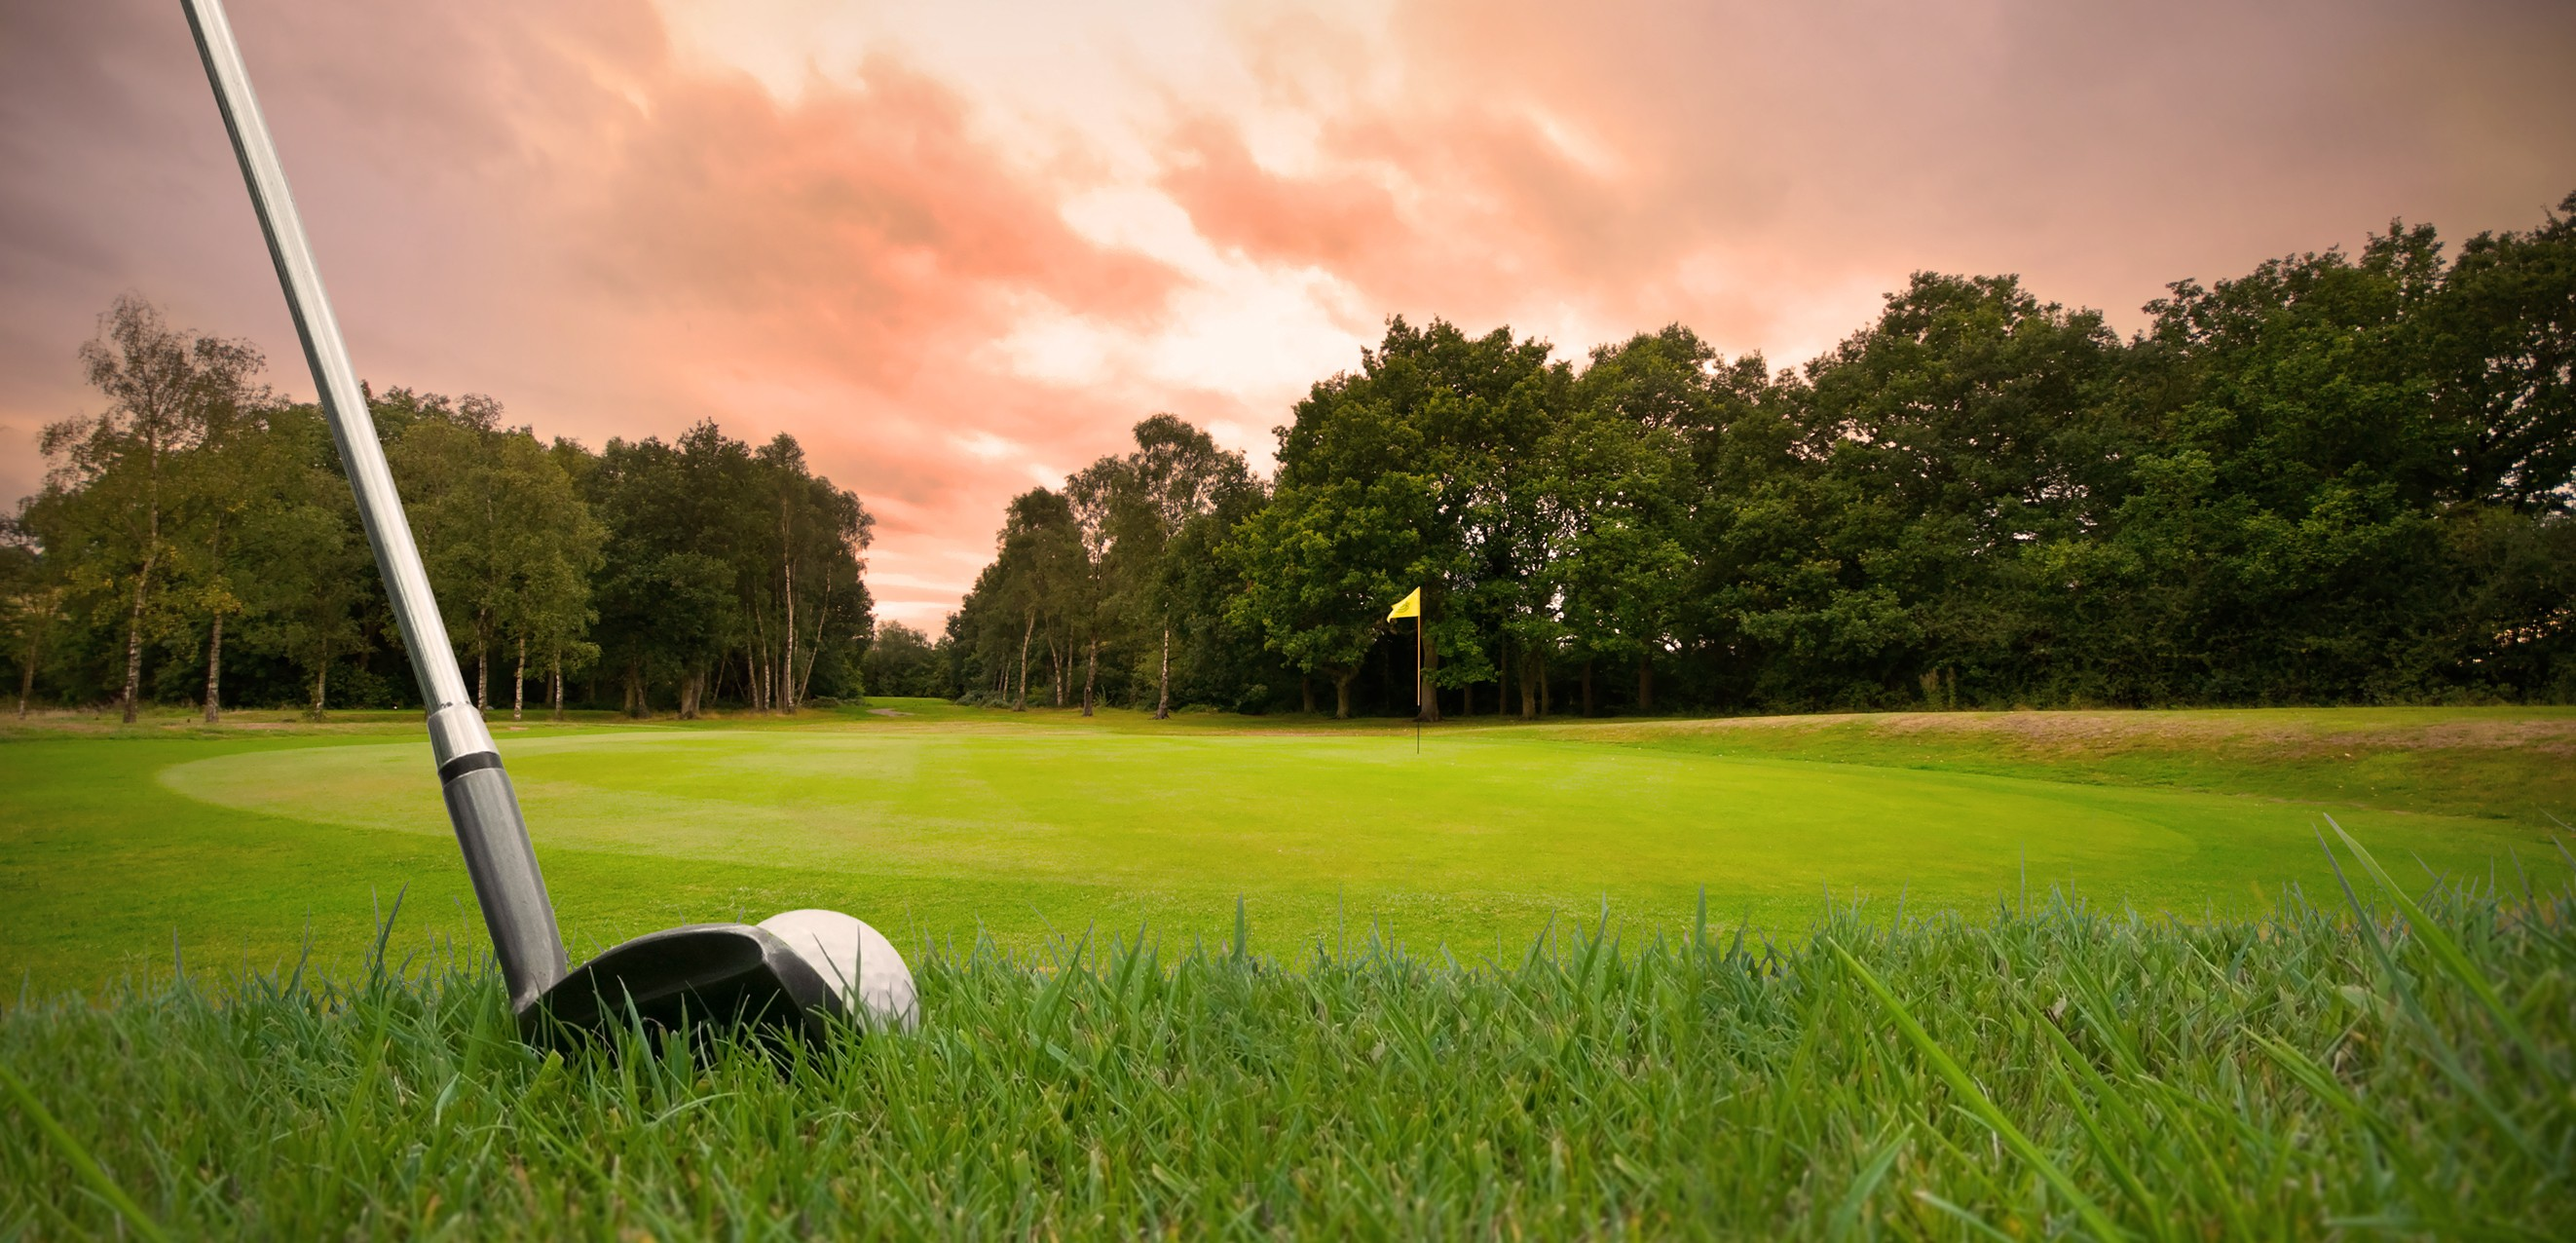 10th Annual Golf Classic